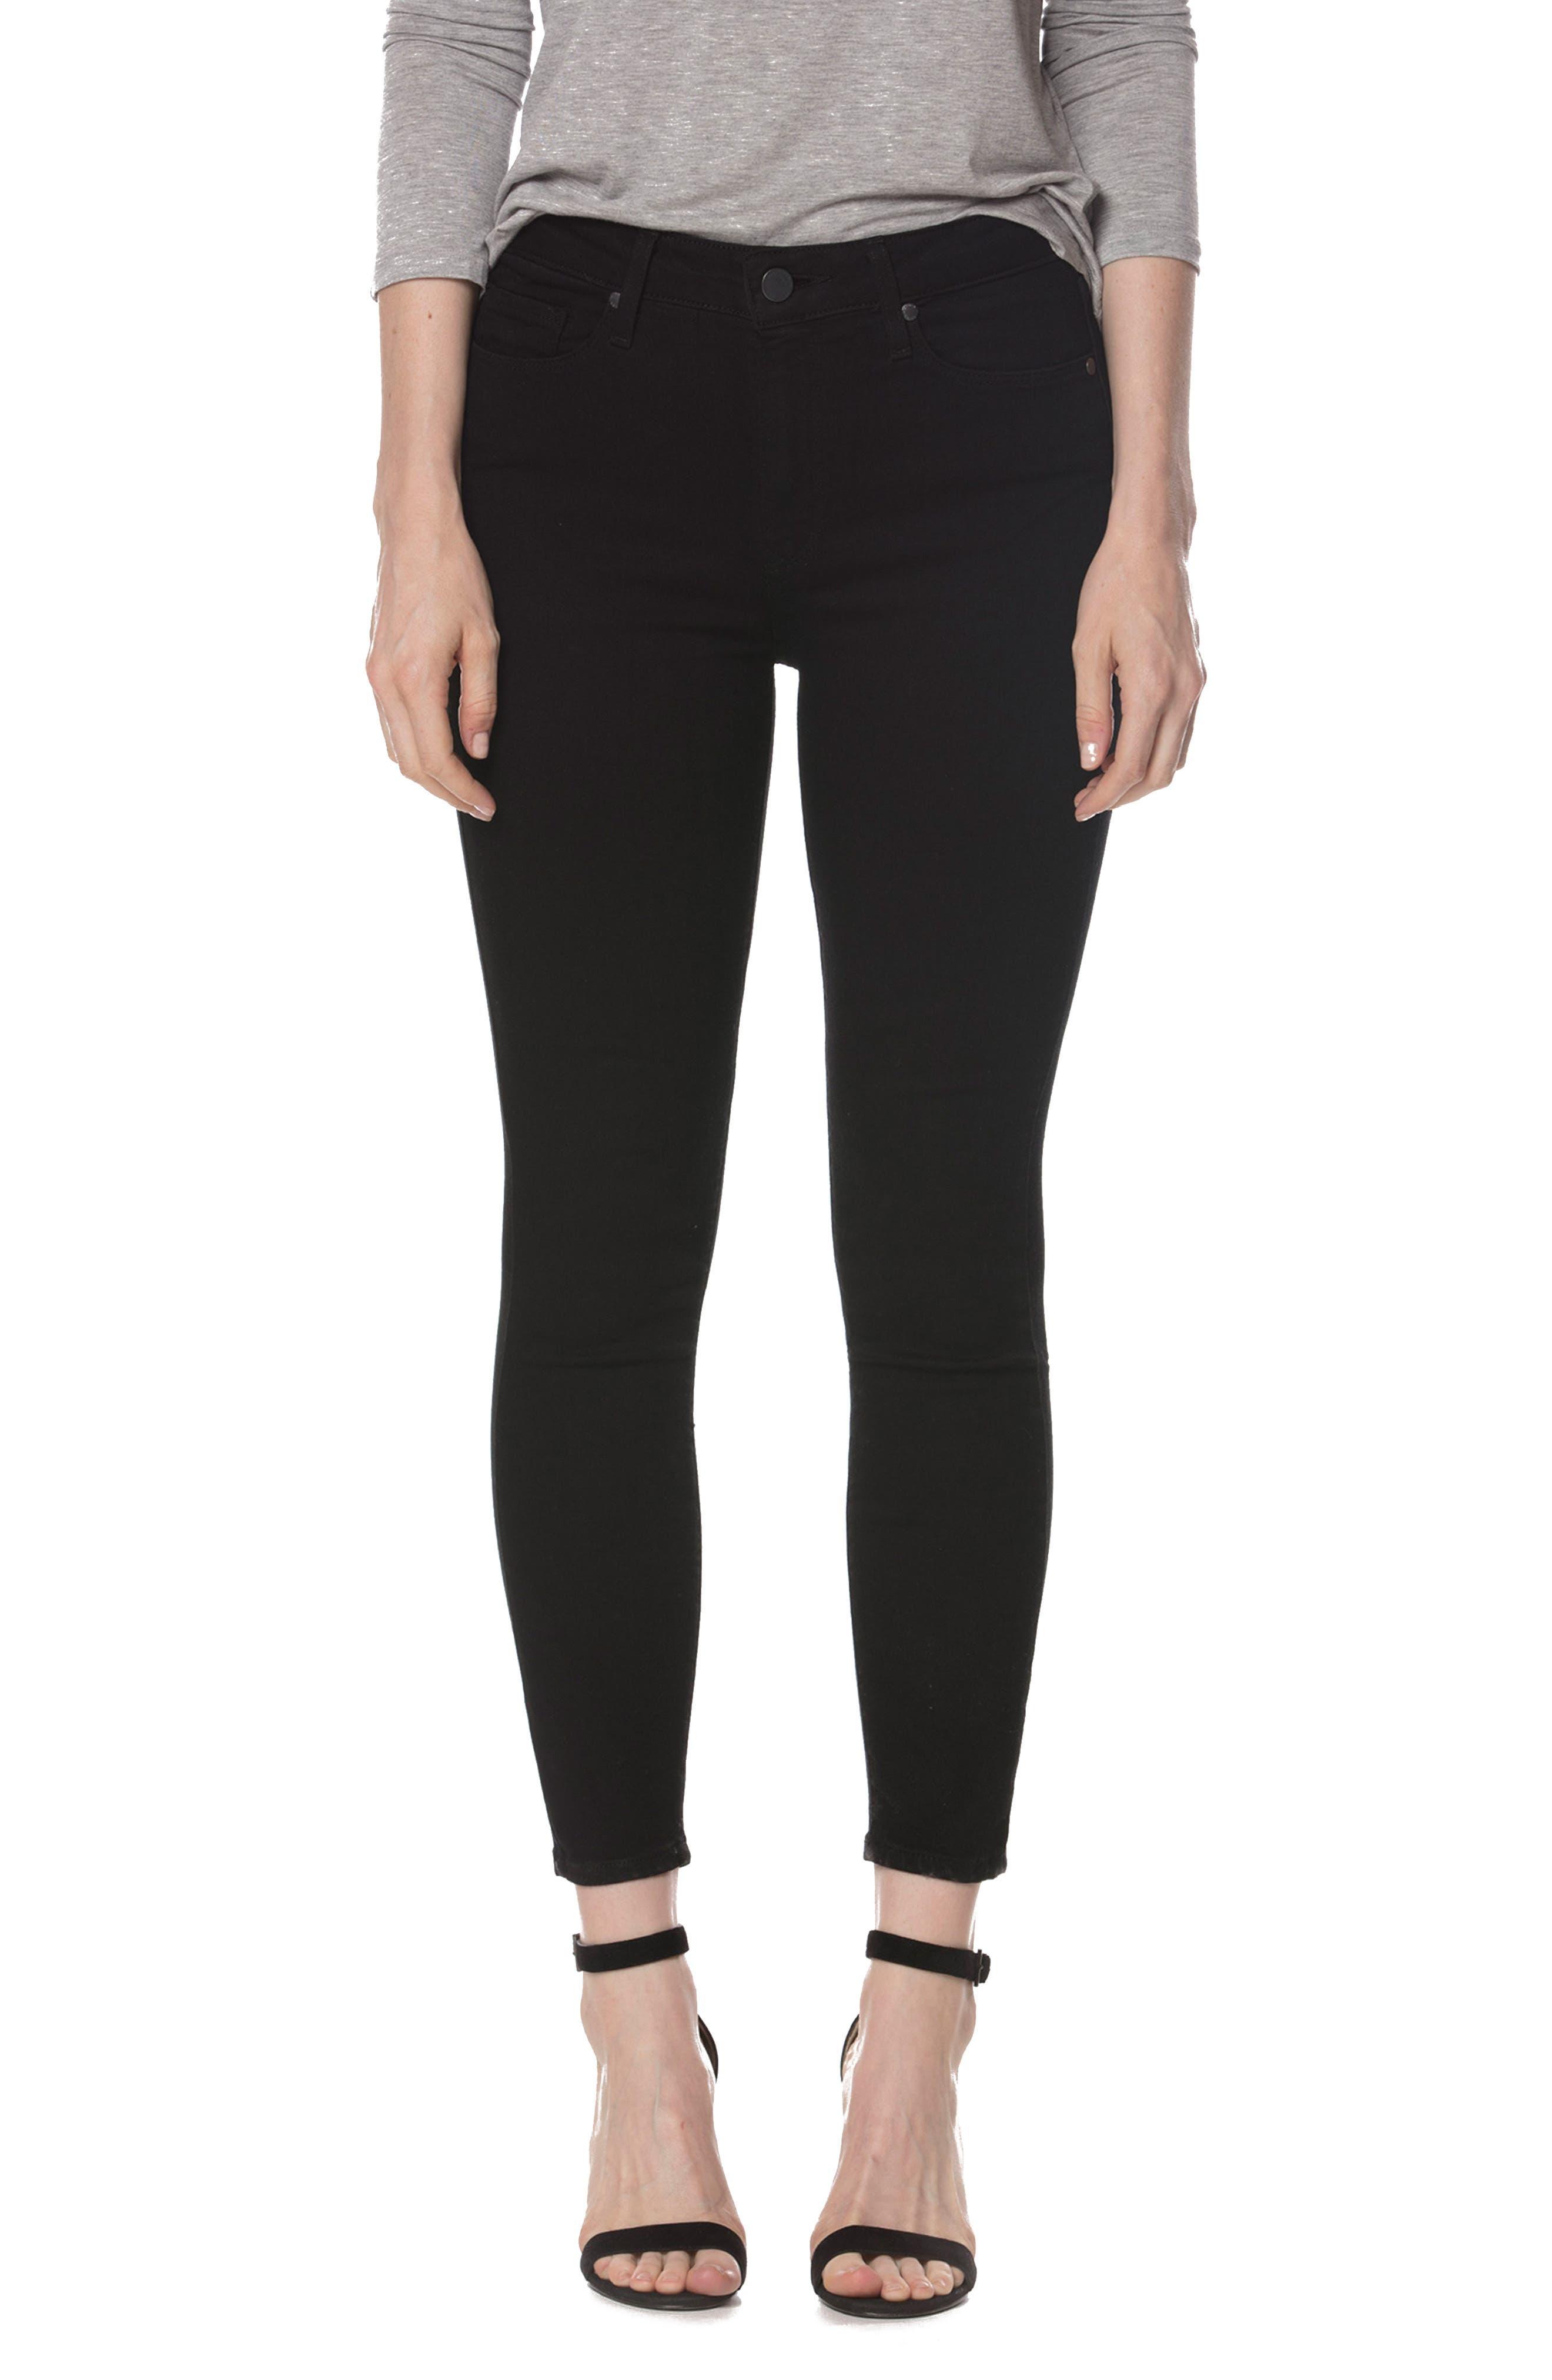 Hoxton High Waist Crop Skinny Jeans,                         Main,                         color, Black Shadow